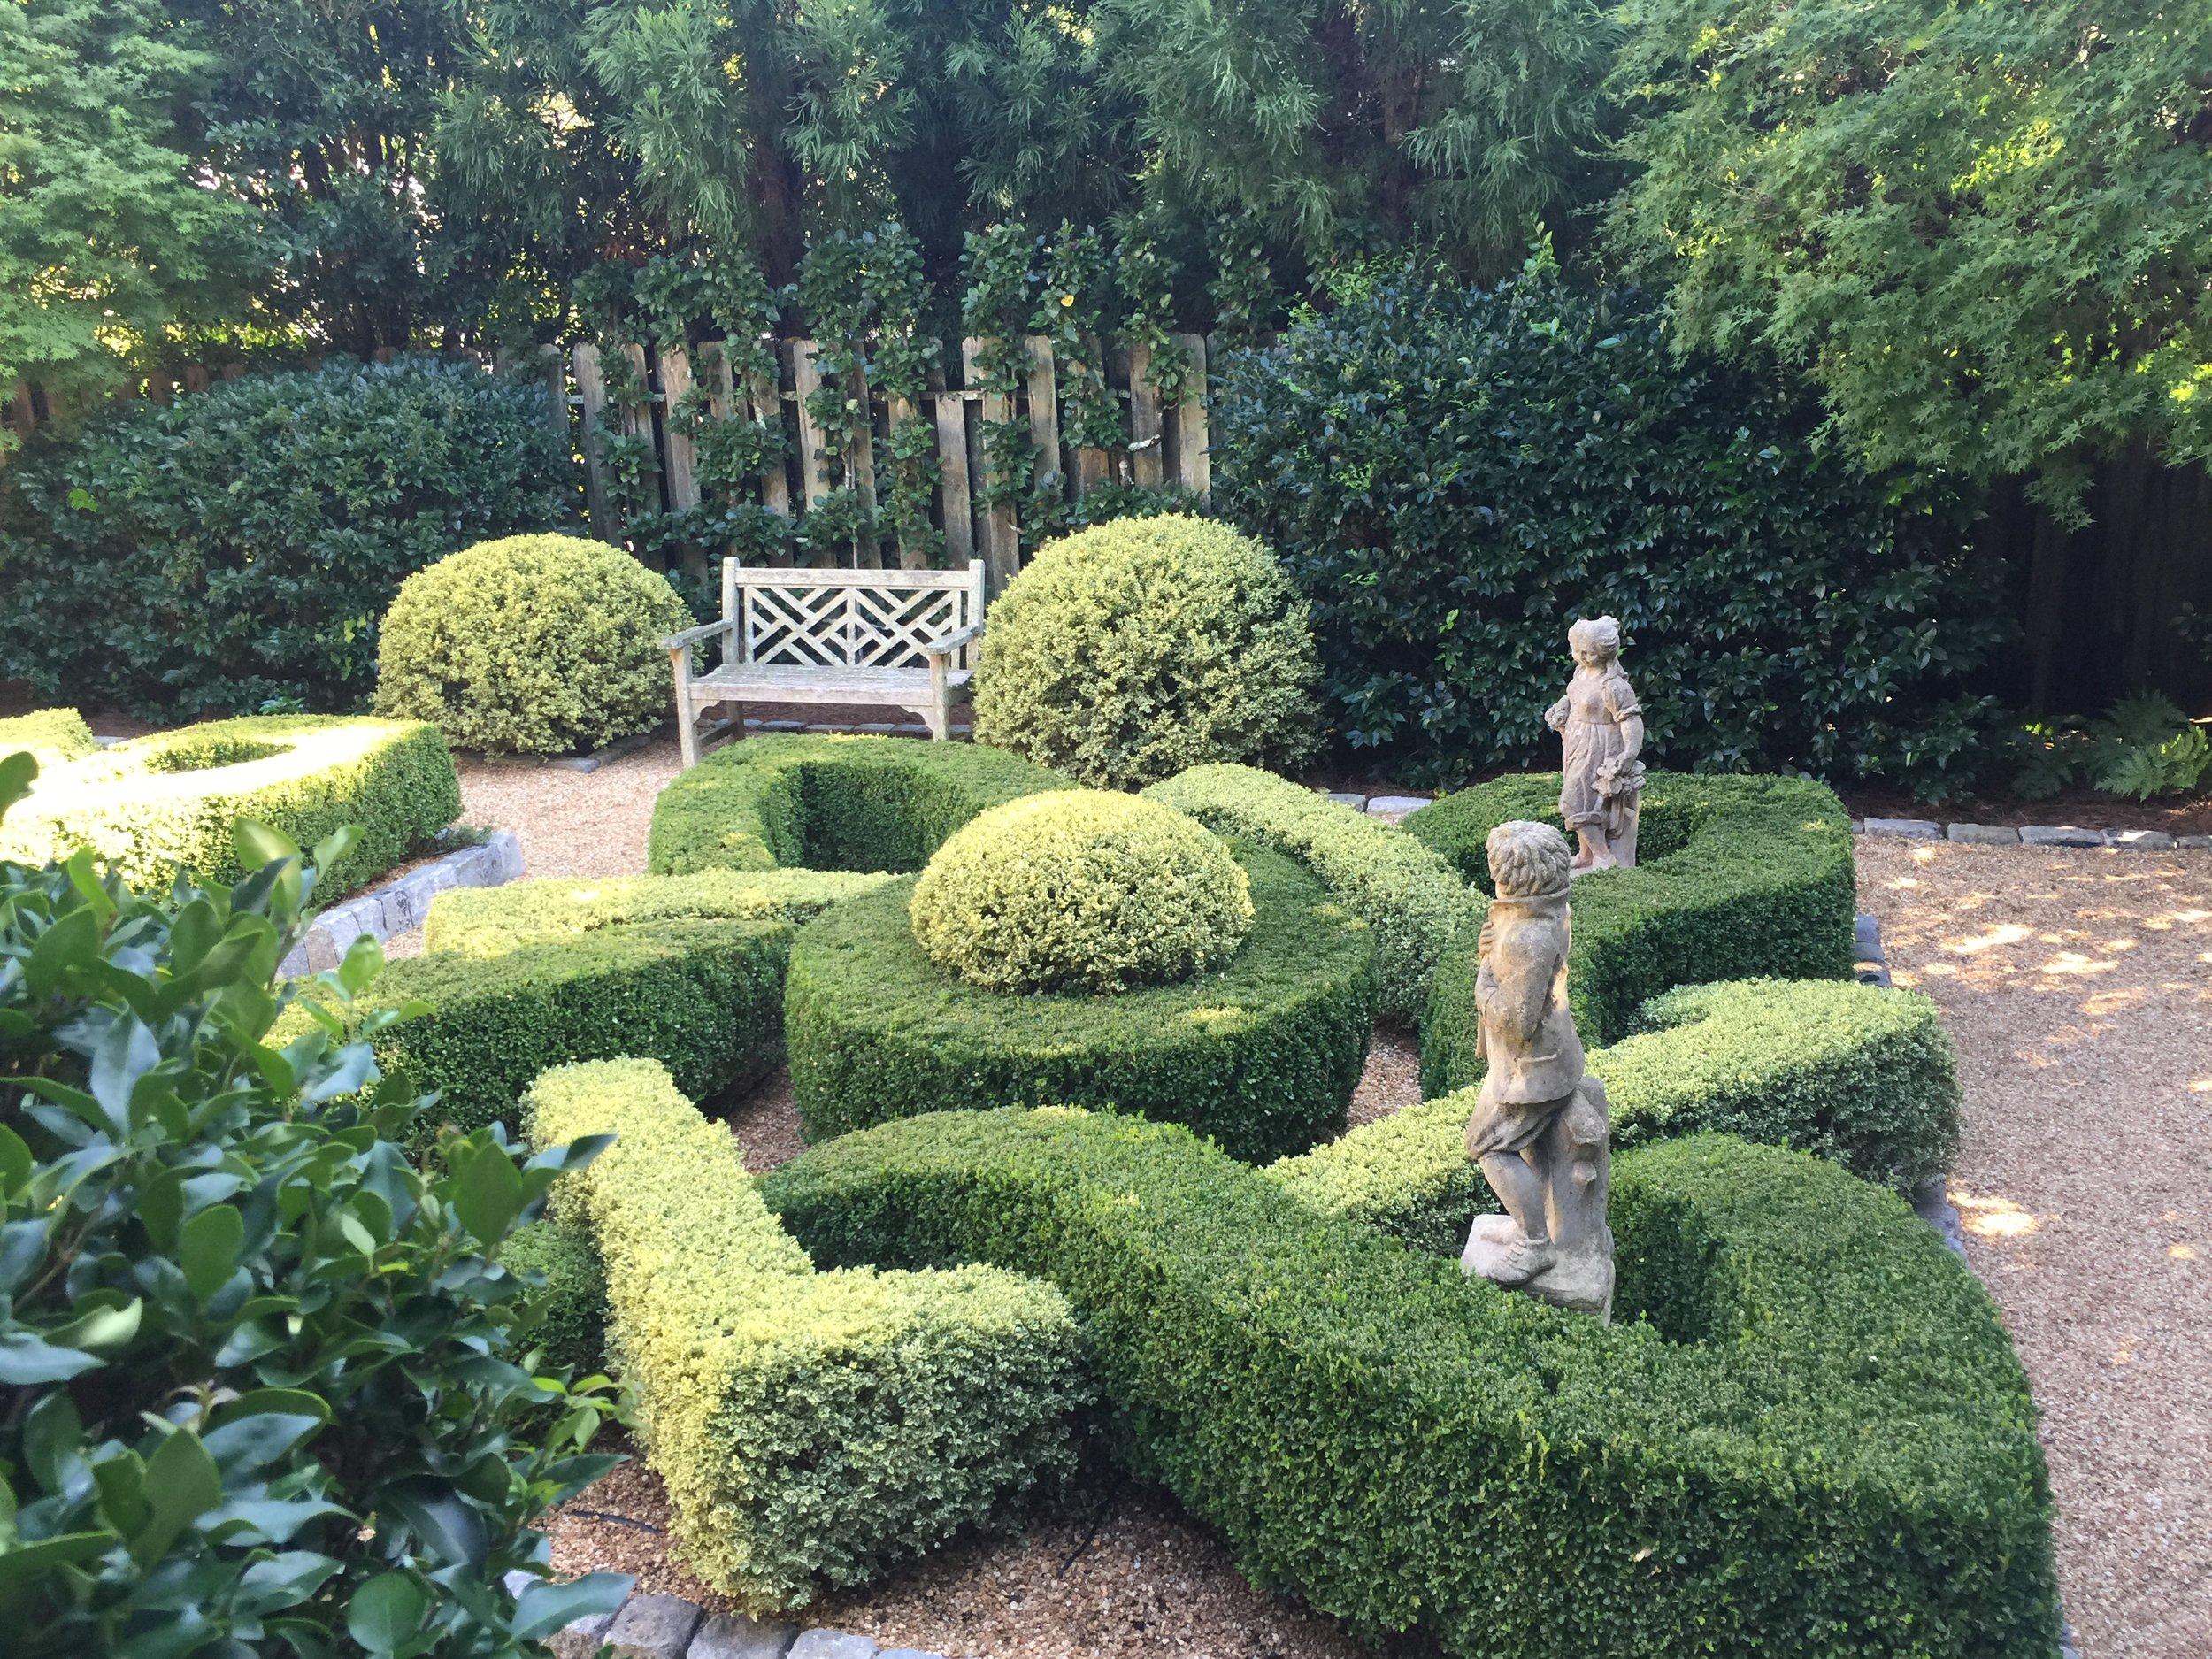 Long view of knot garden.